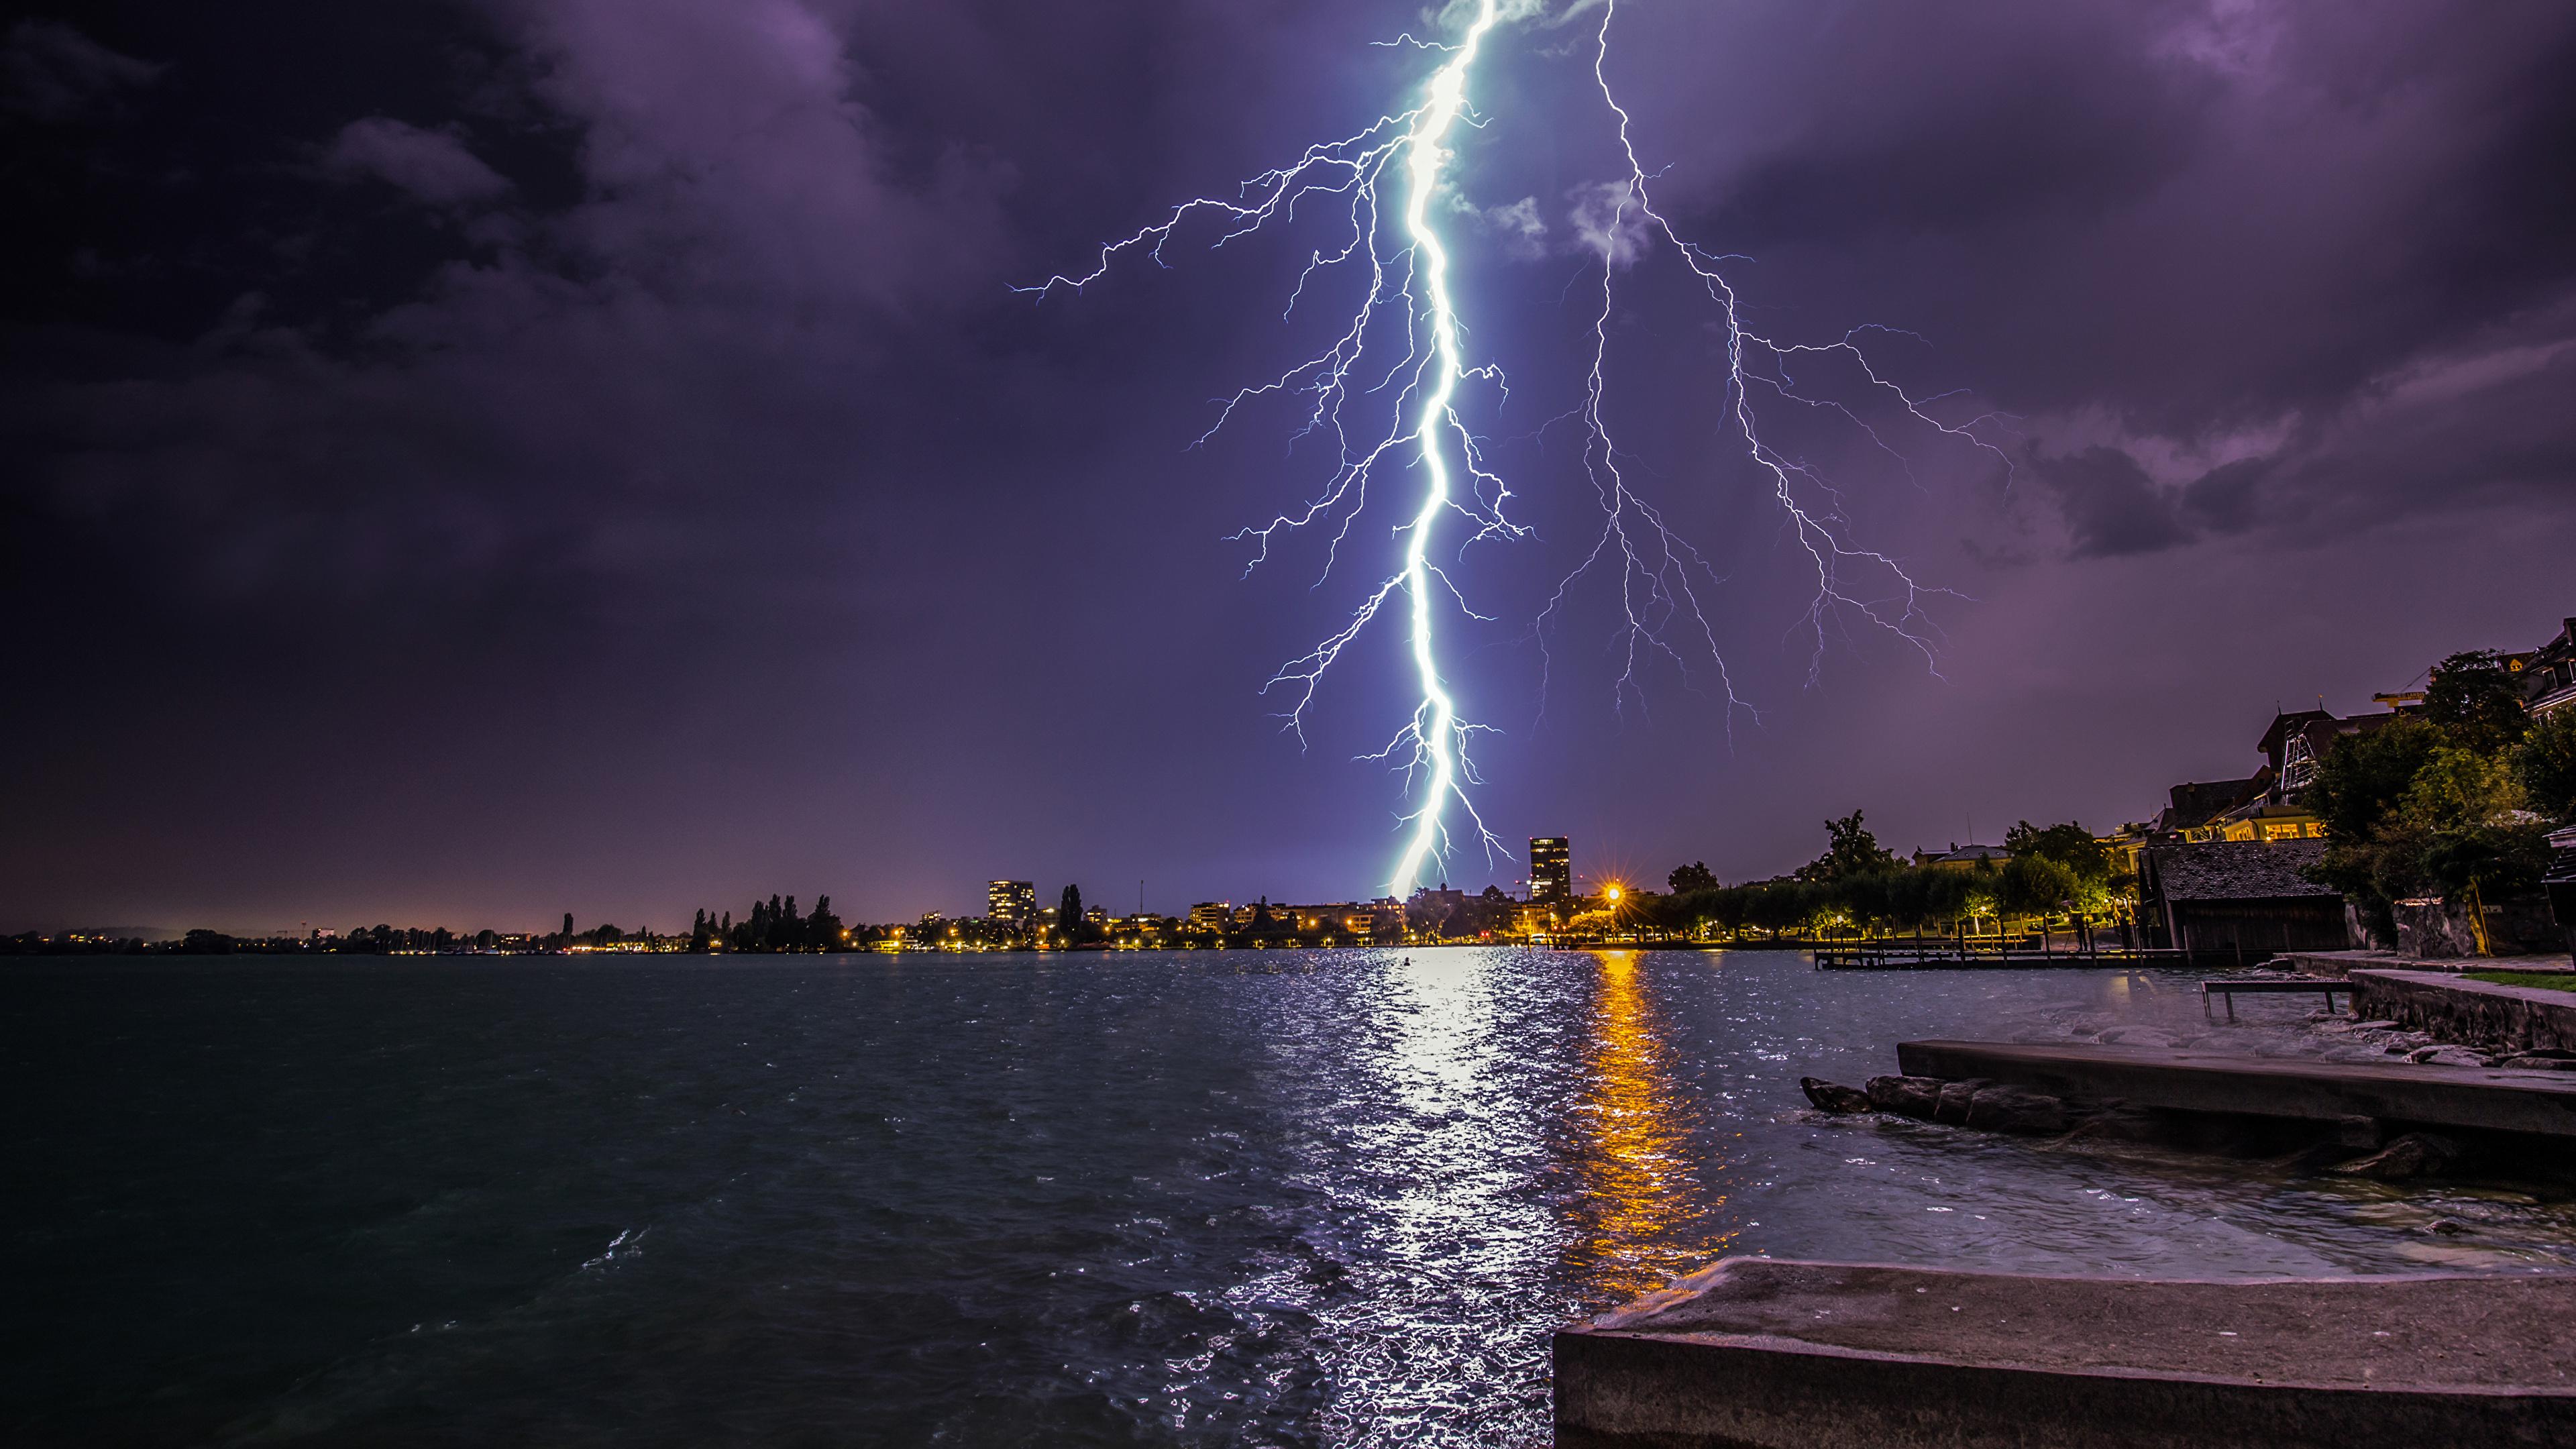 Image Switzerland Zugerberg Lightning Nature Lake Coast night time 3840x2160 lightning bolts Night